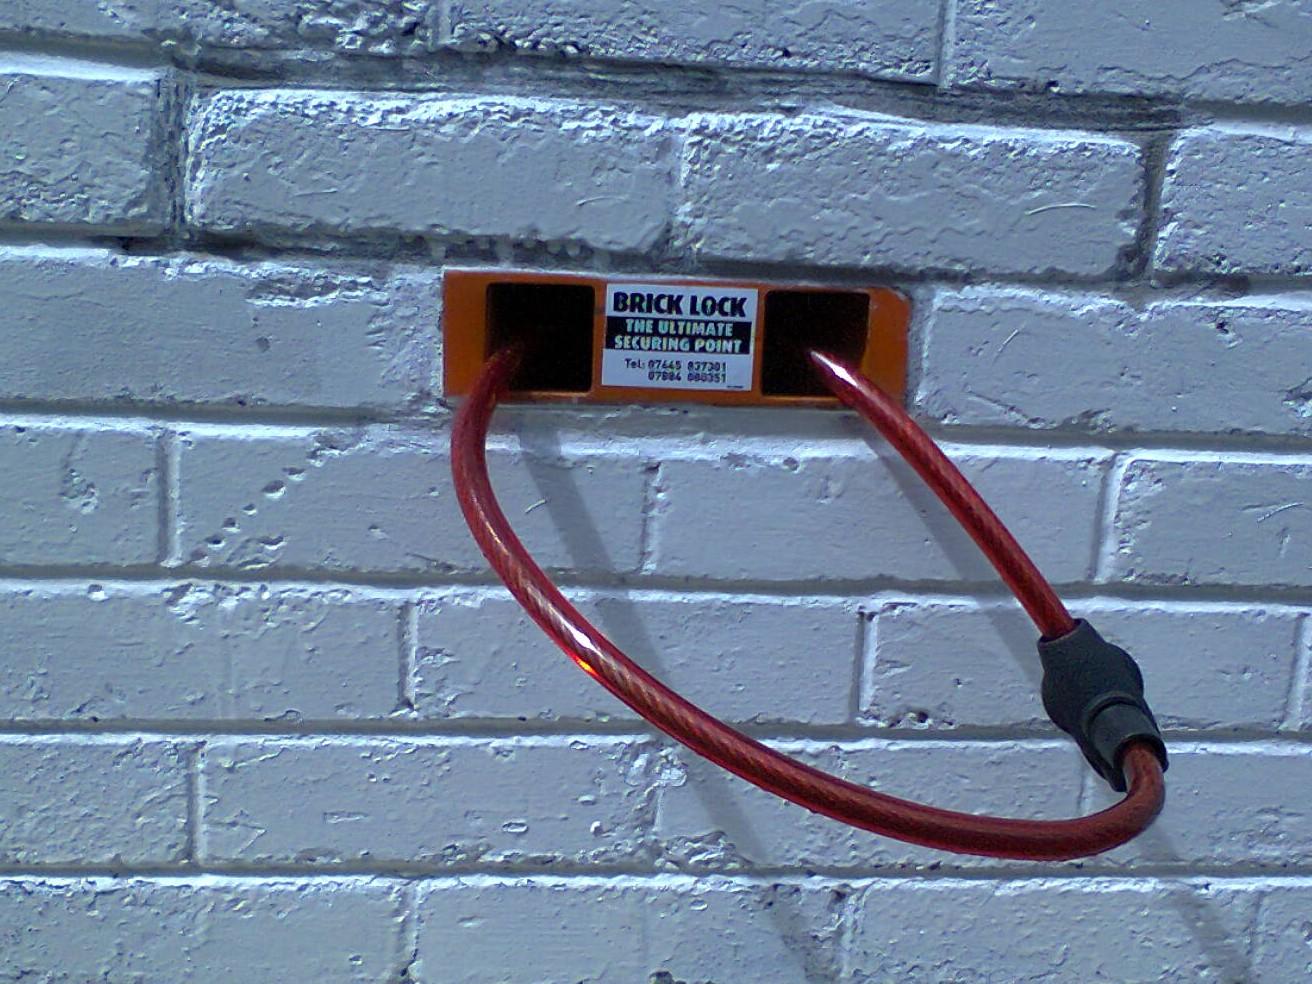 The BrickLock provides a convenient securing point